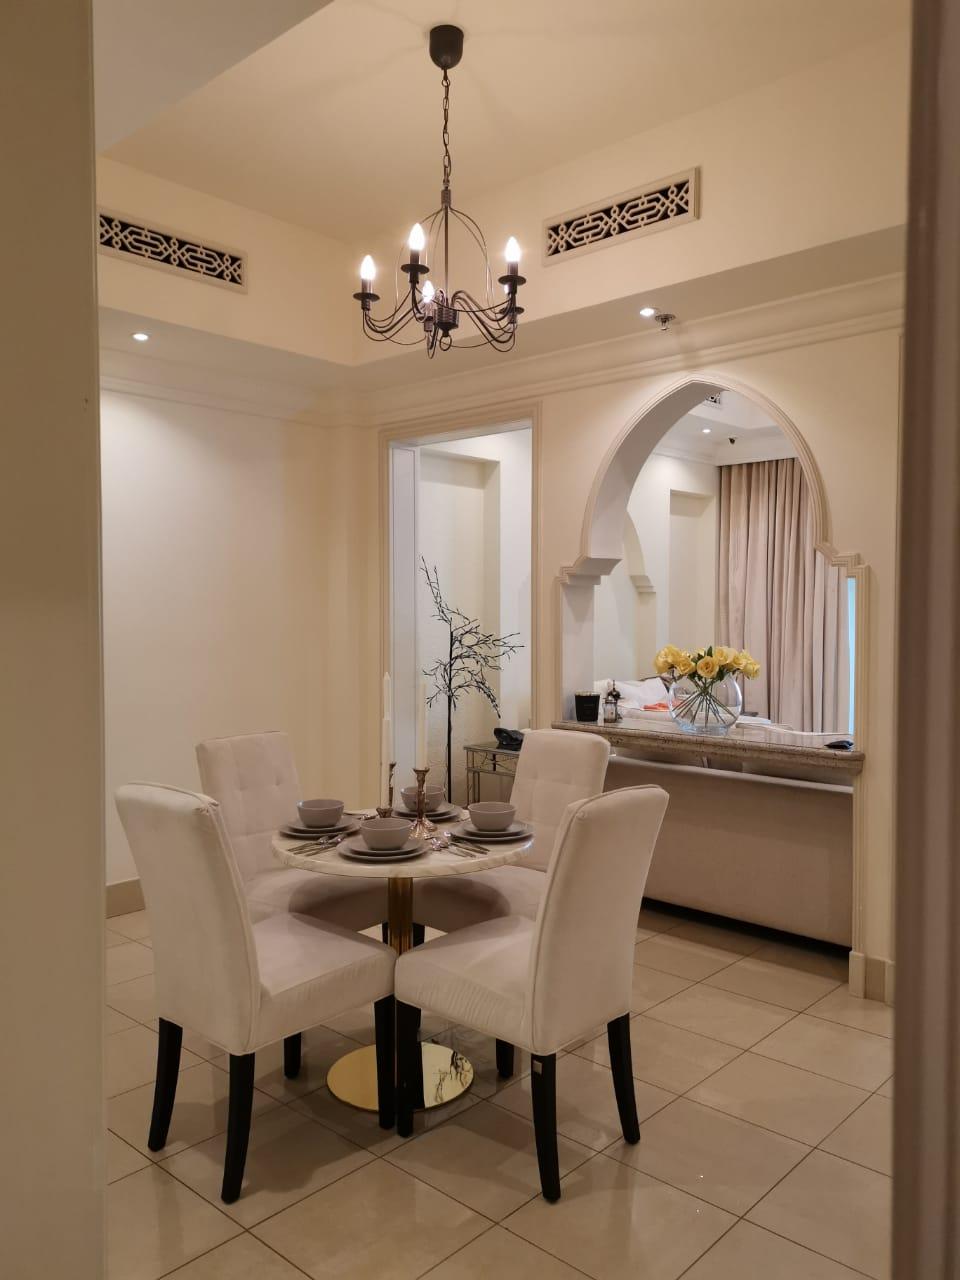 Wonderful stay in the heart of Dubai - SouK Al Bahar photo 27263142